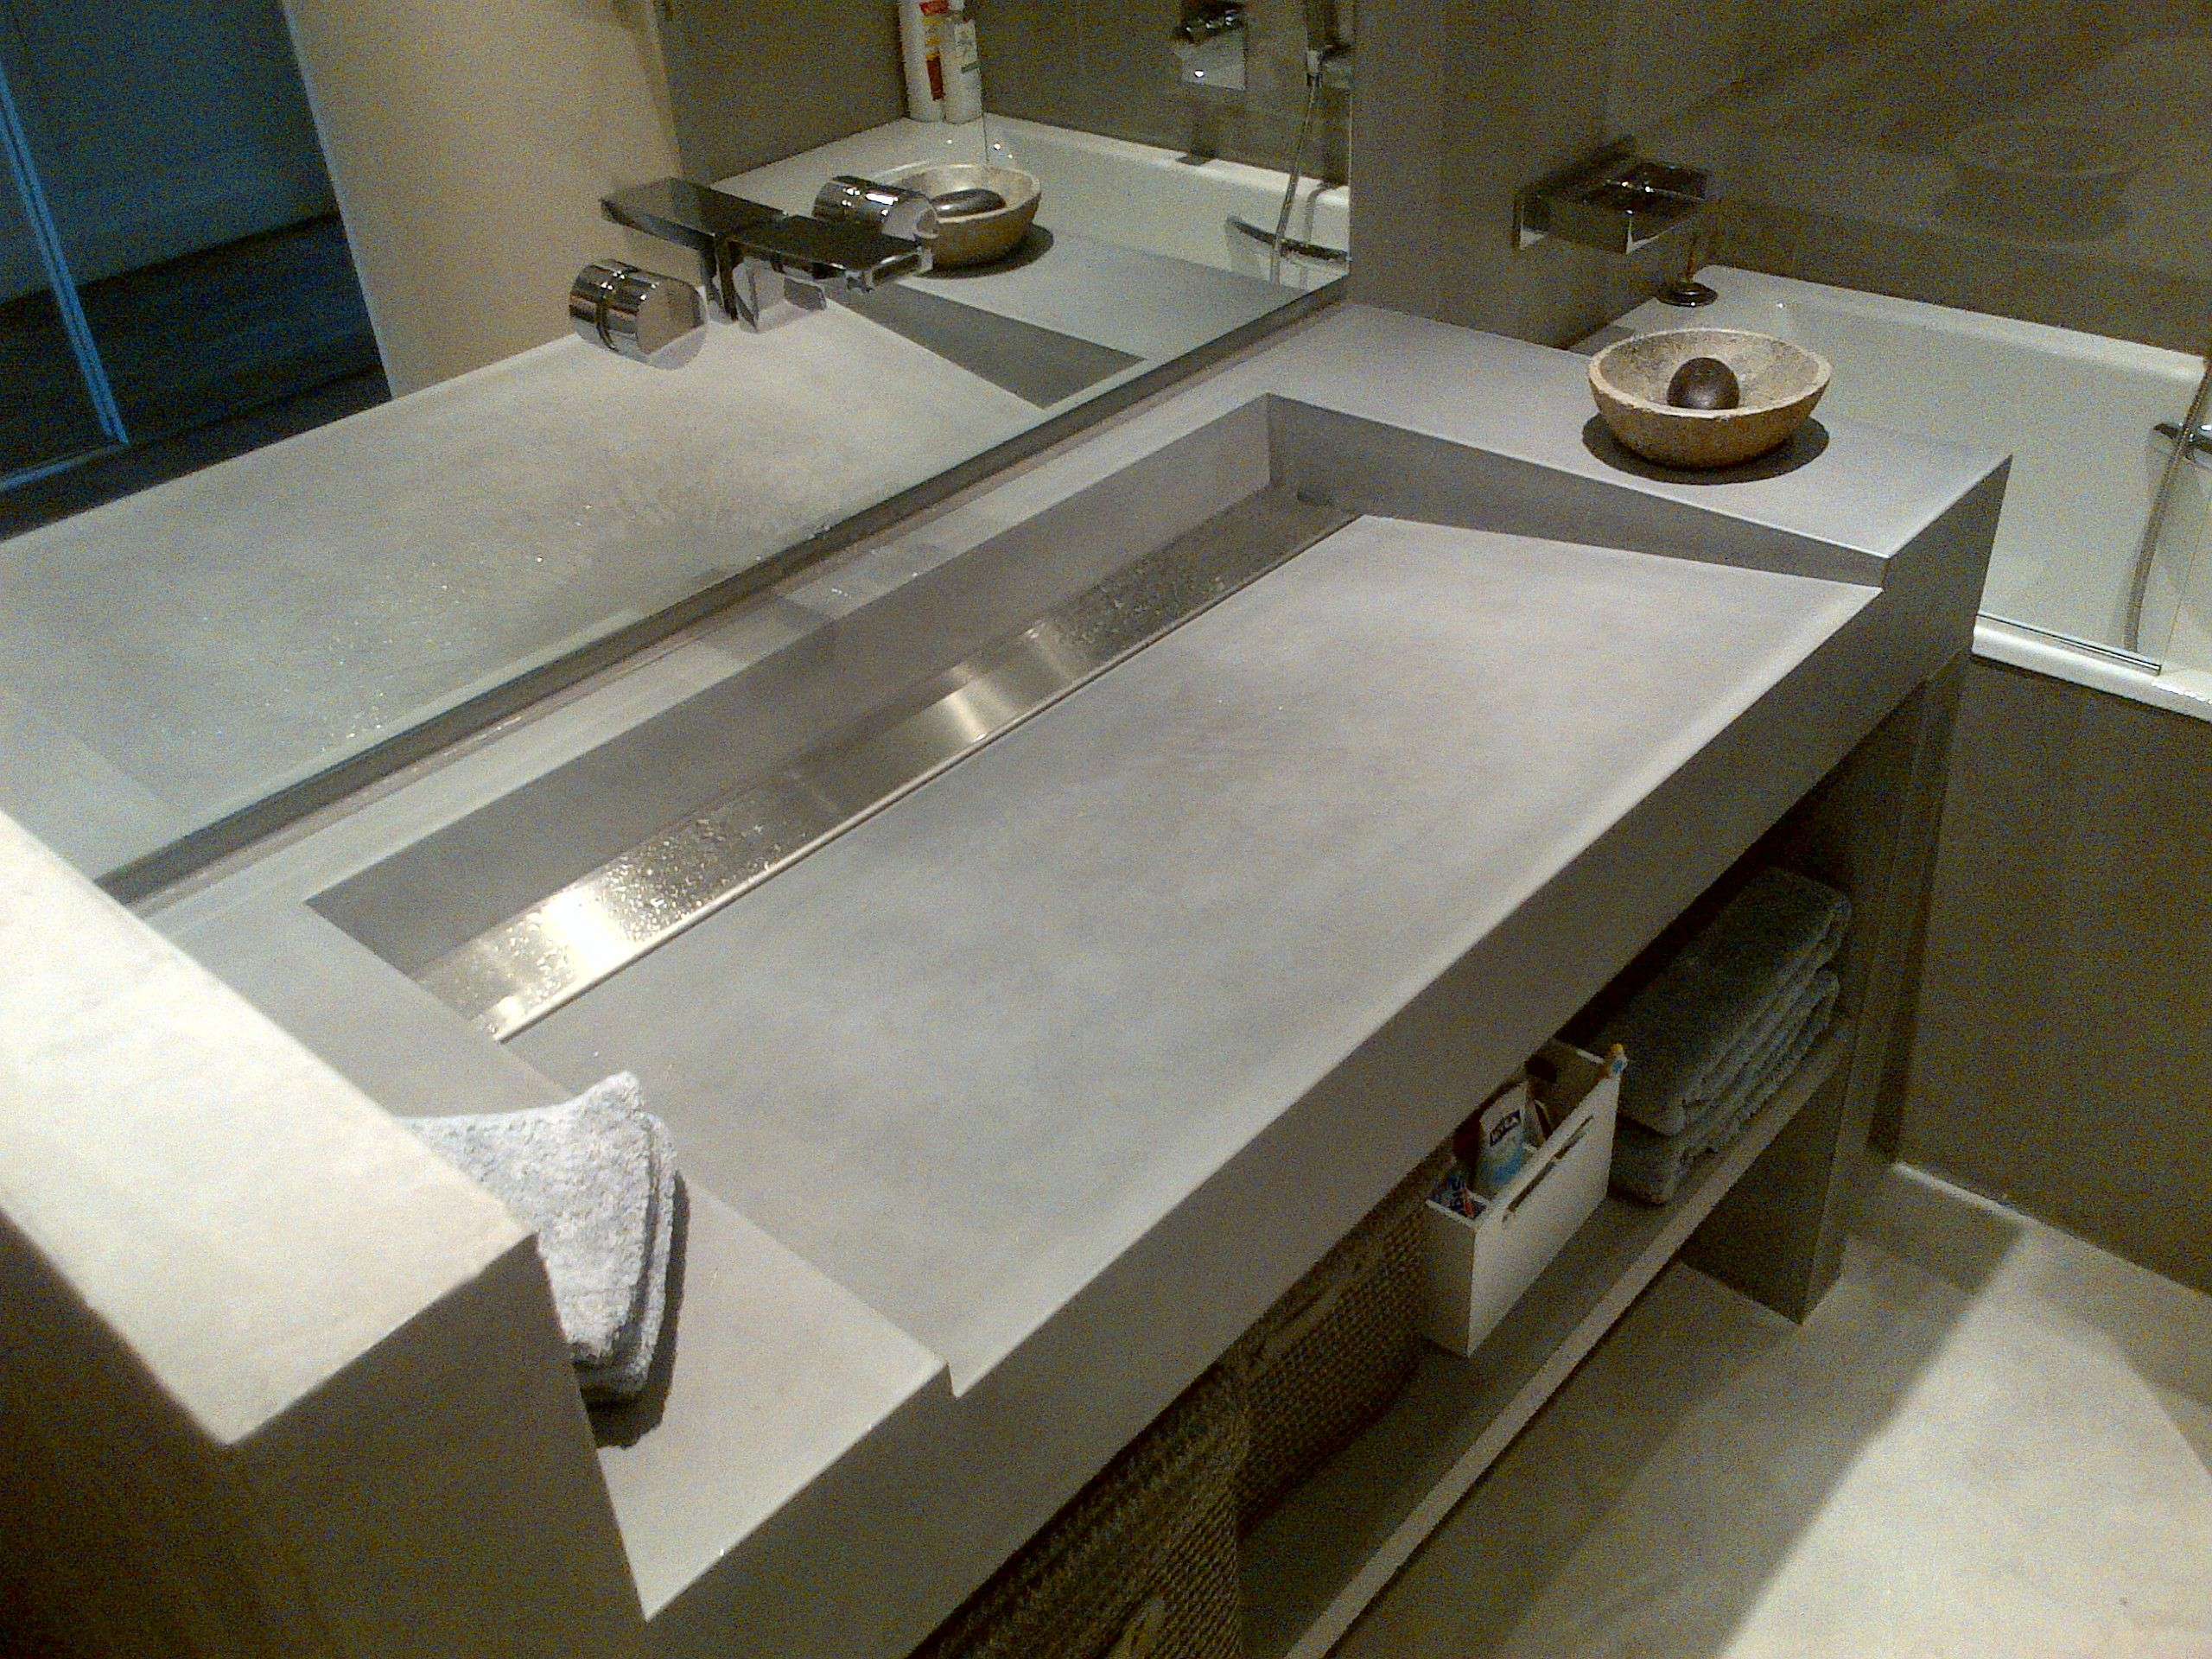 Vasques b ton inox bross concrete by lcda inspiration hotel pinterest inox bross - Beton lcda ...